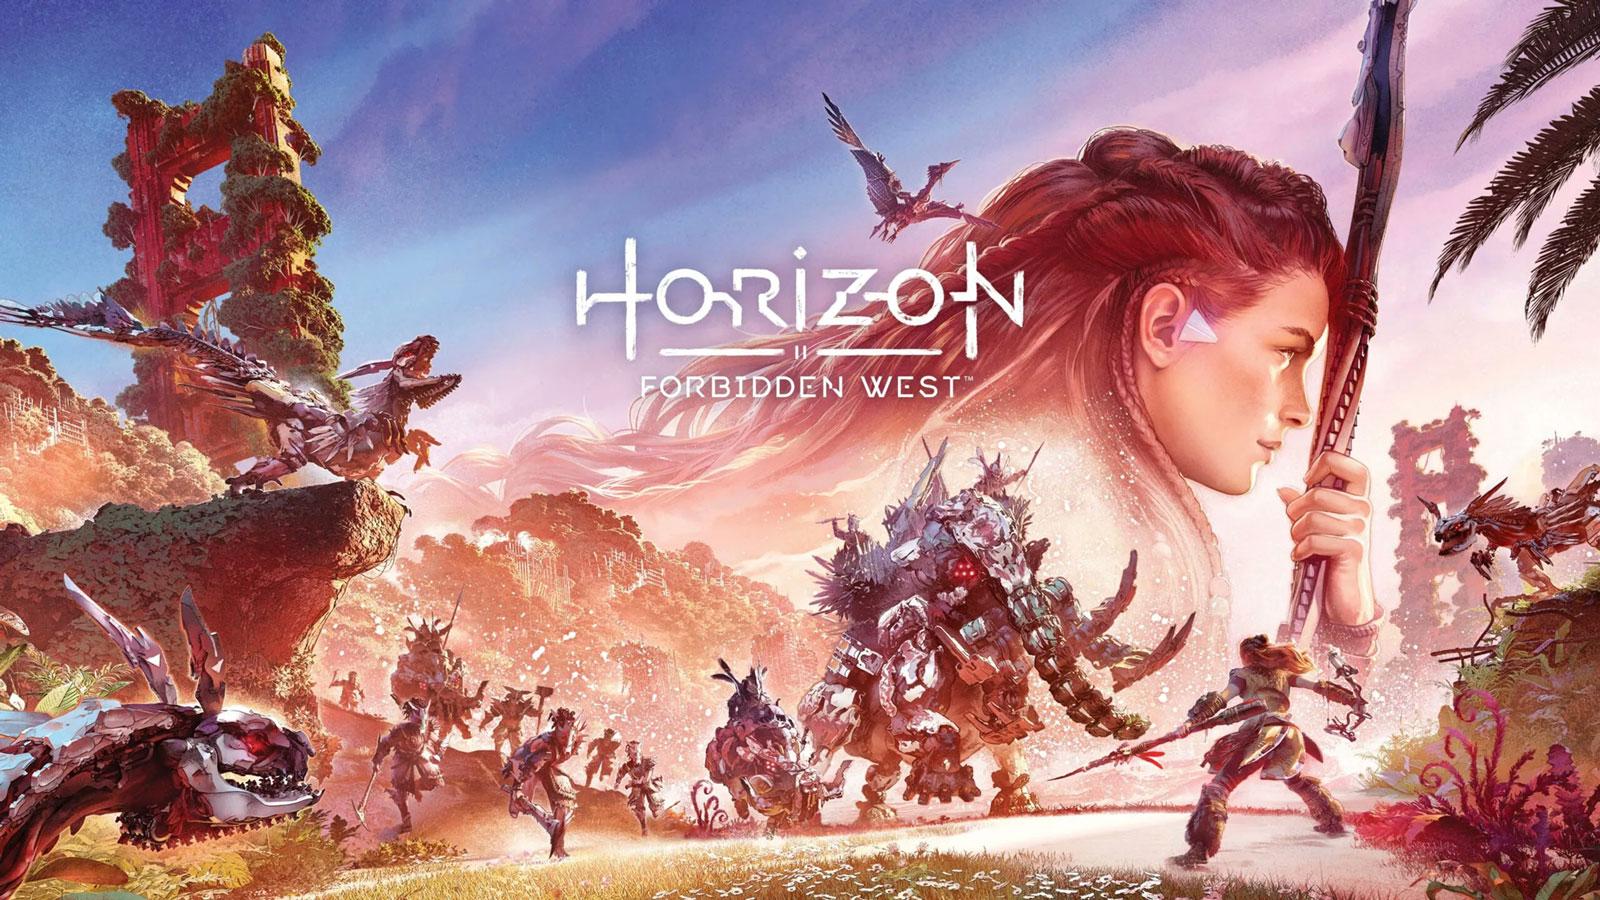 Free Horizon: Forbidden West Wallpaper in 1600x900